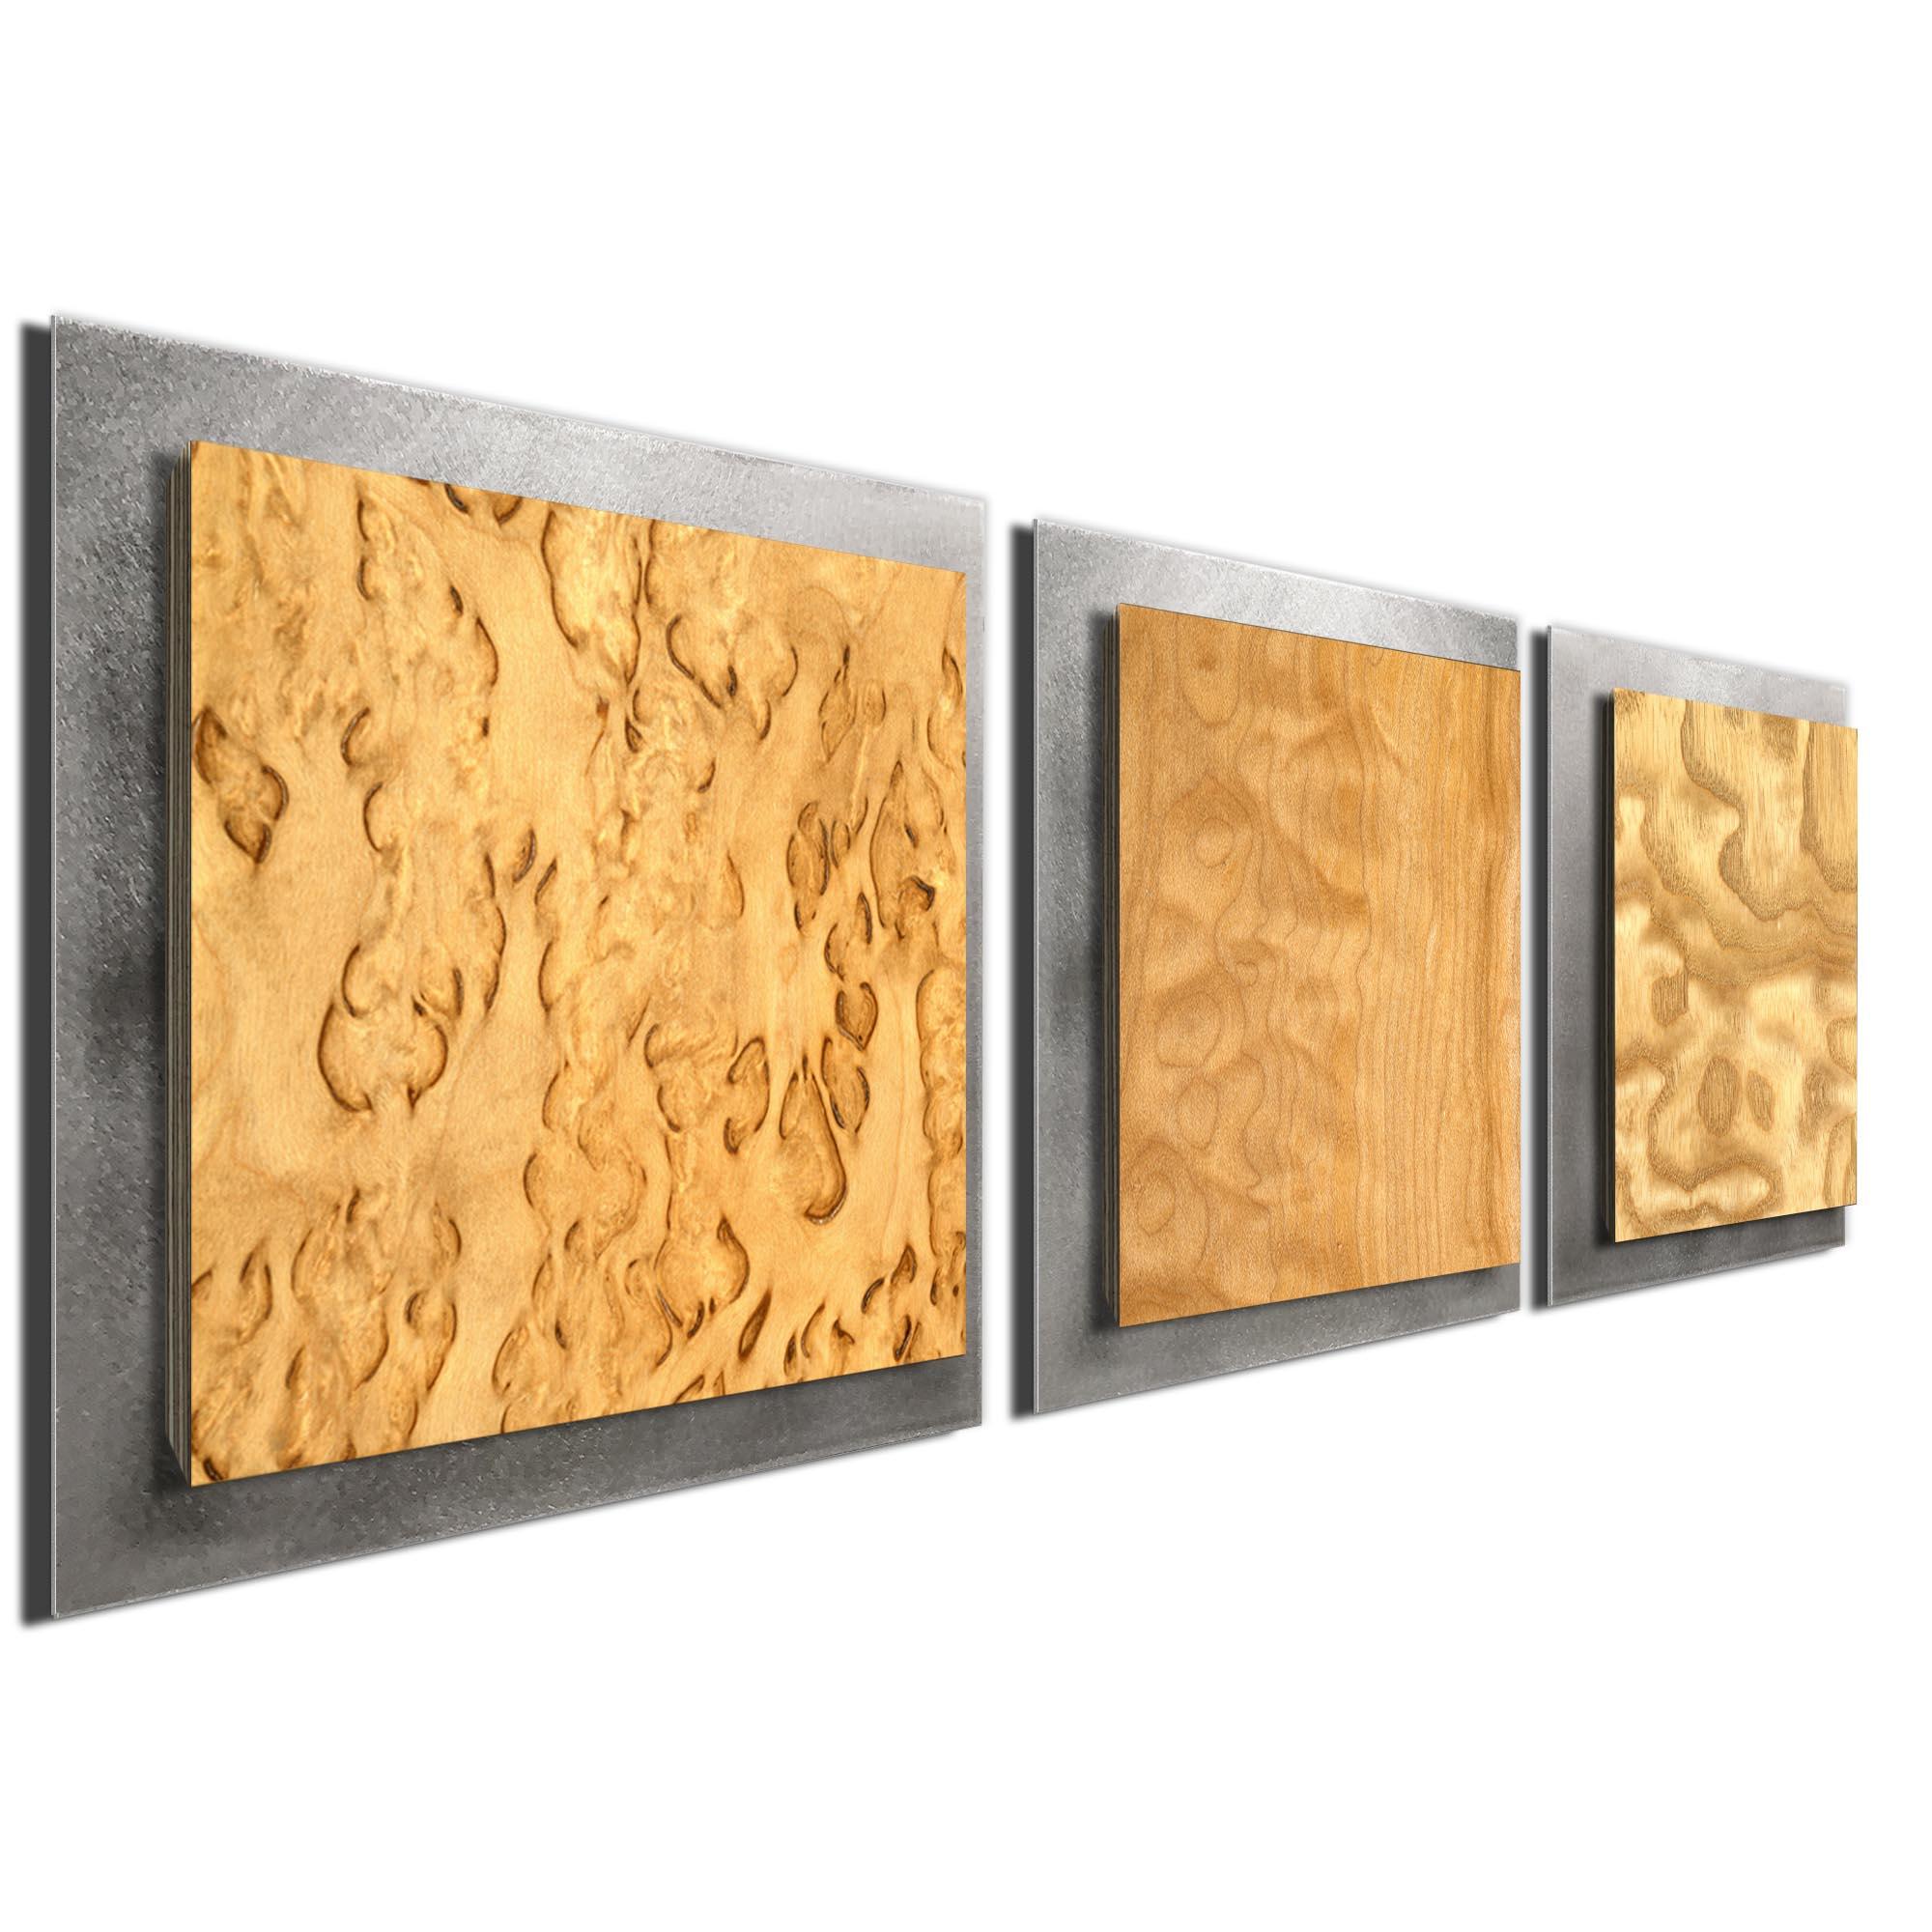 Light Burl Essence Silver by Jackson Wright Rustic Modern Style Wood Wall Art - Image 2